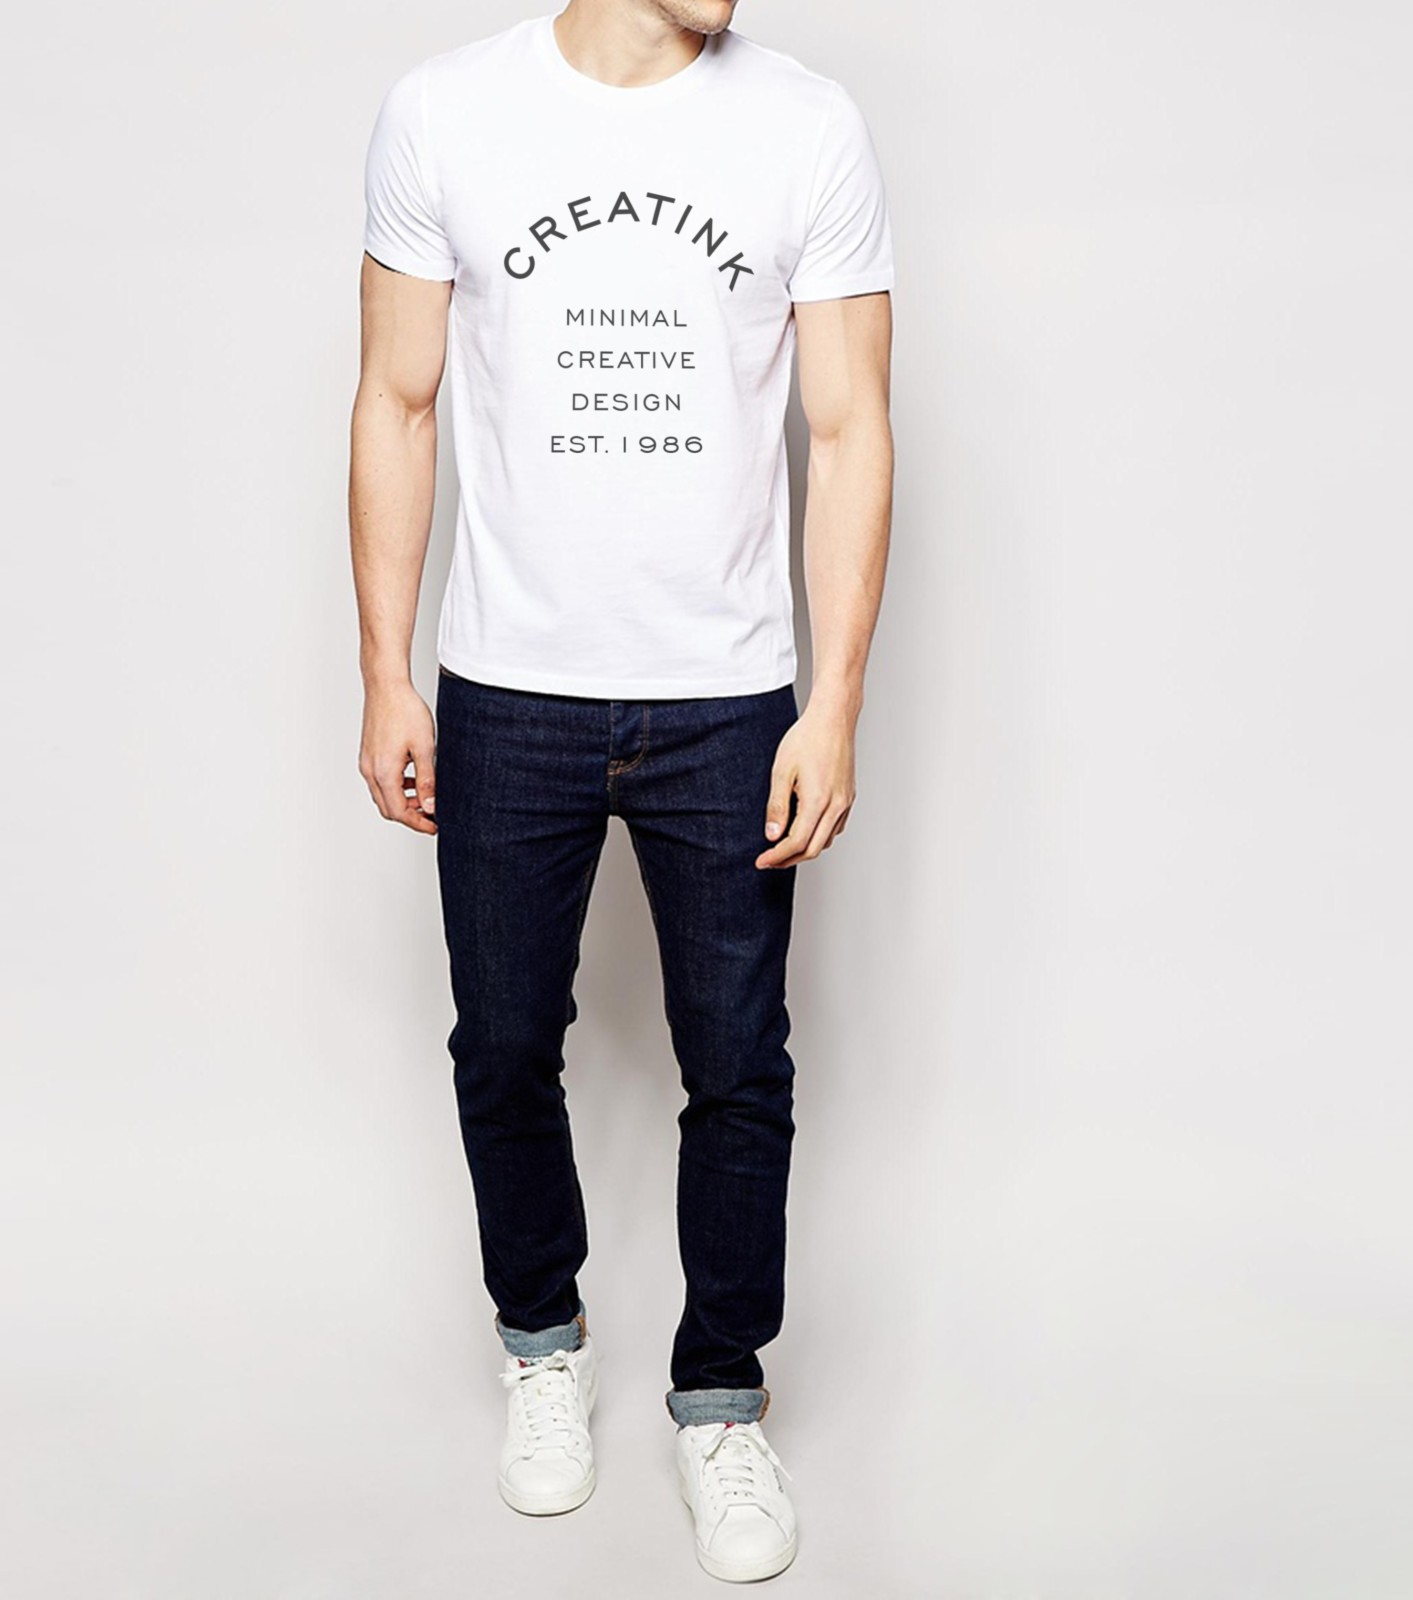 f7b809948eff T-shirt design - Minimalistit - Designed by Creatink